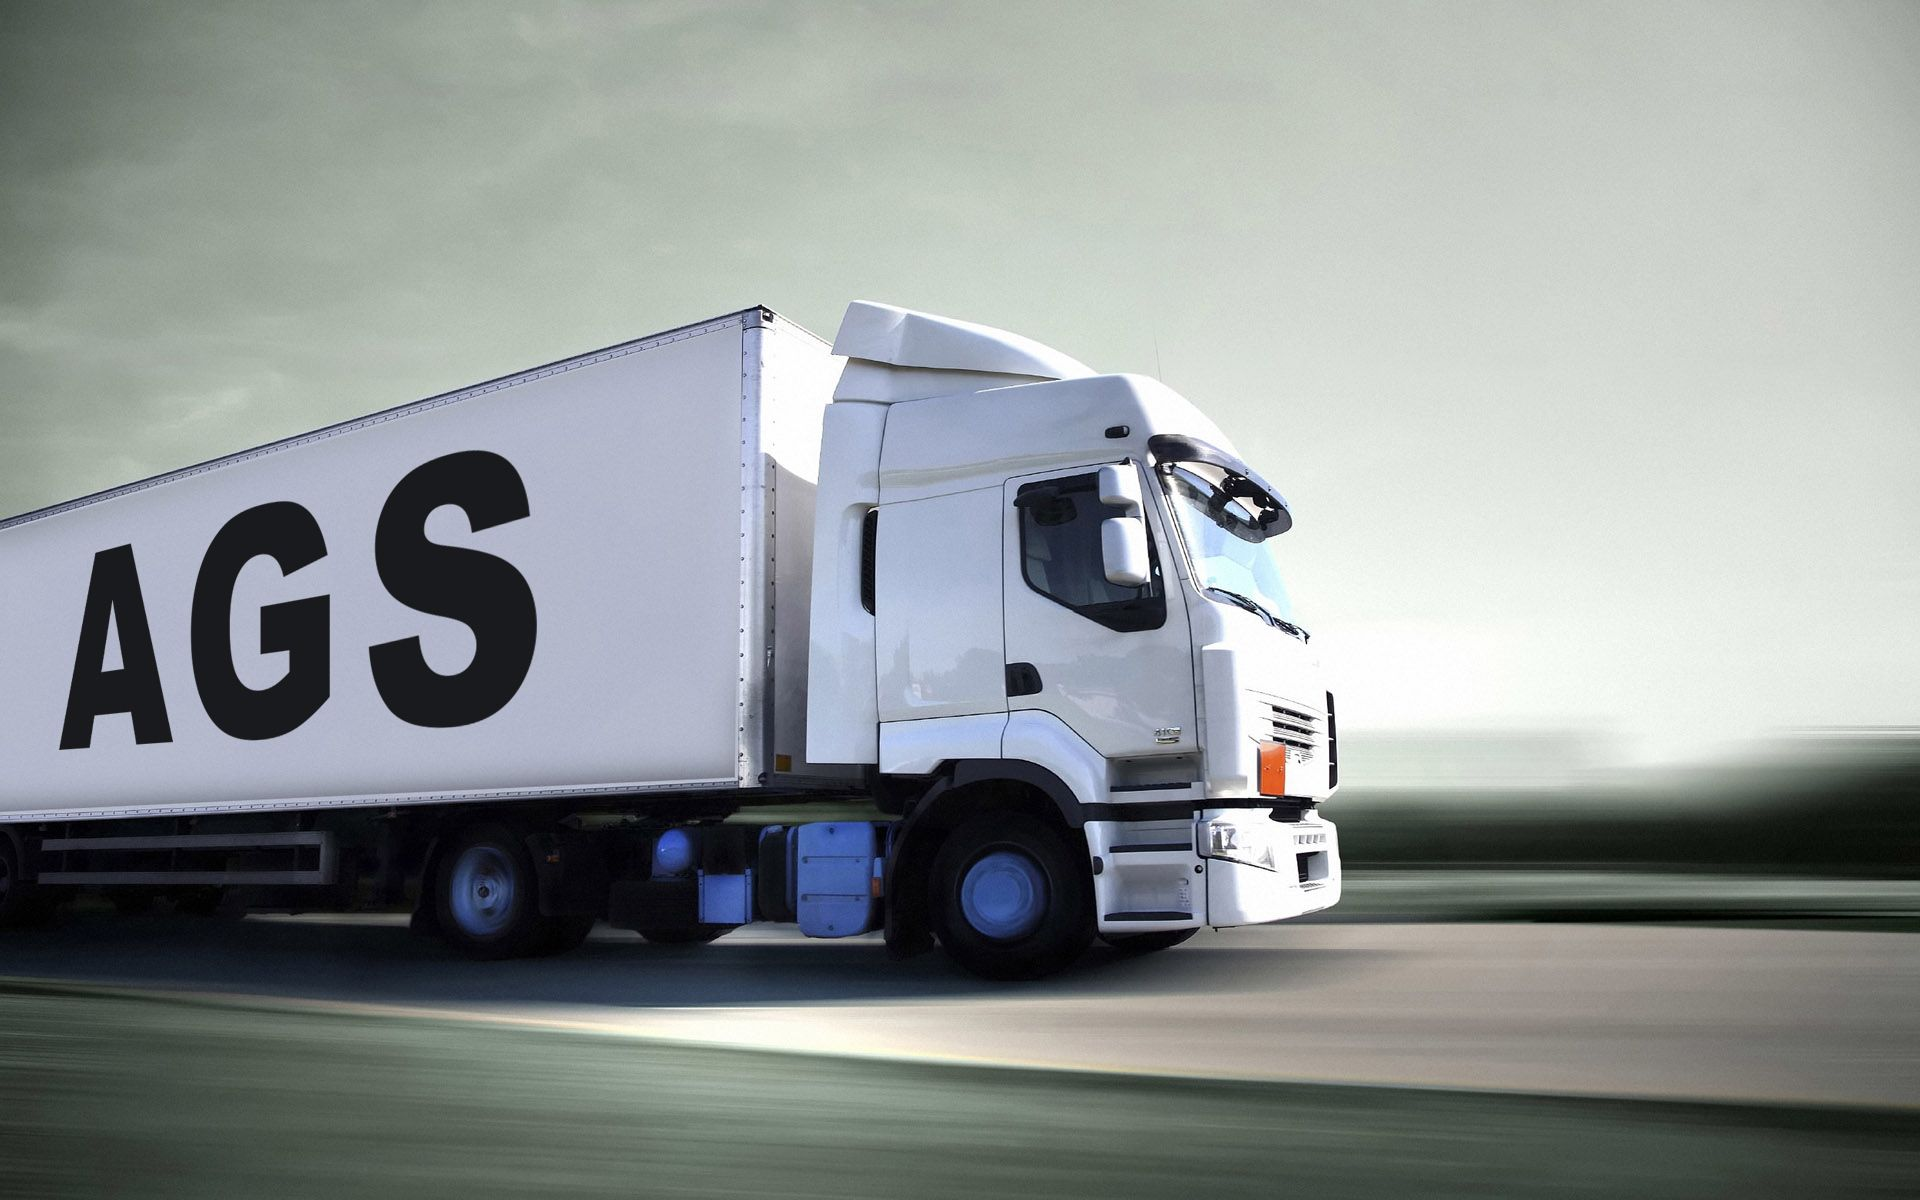 Ags Logistics Pvt Ltd ags logistics llc - dubai (agslogisticsllc_dubai) on pinterest